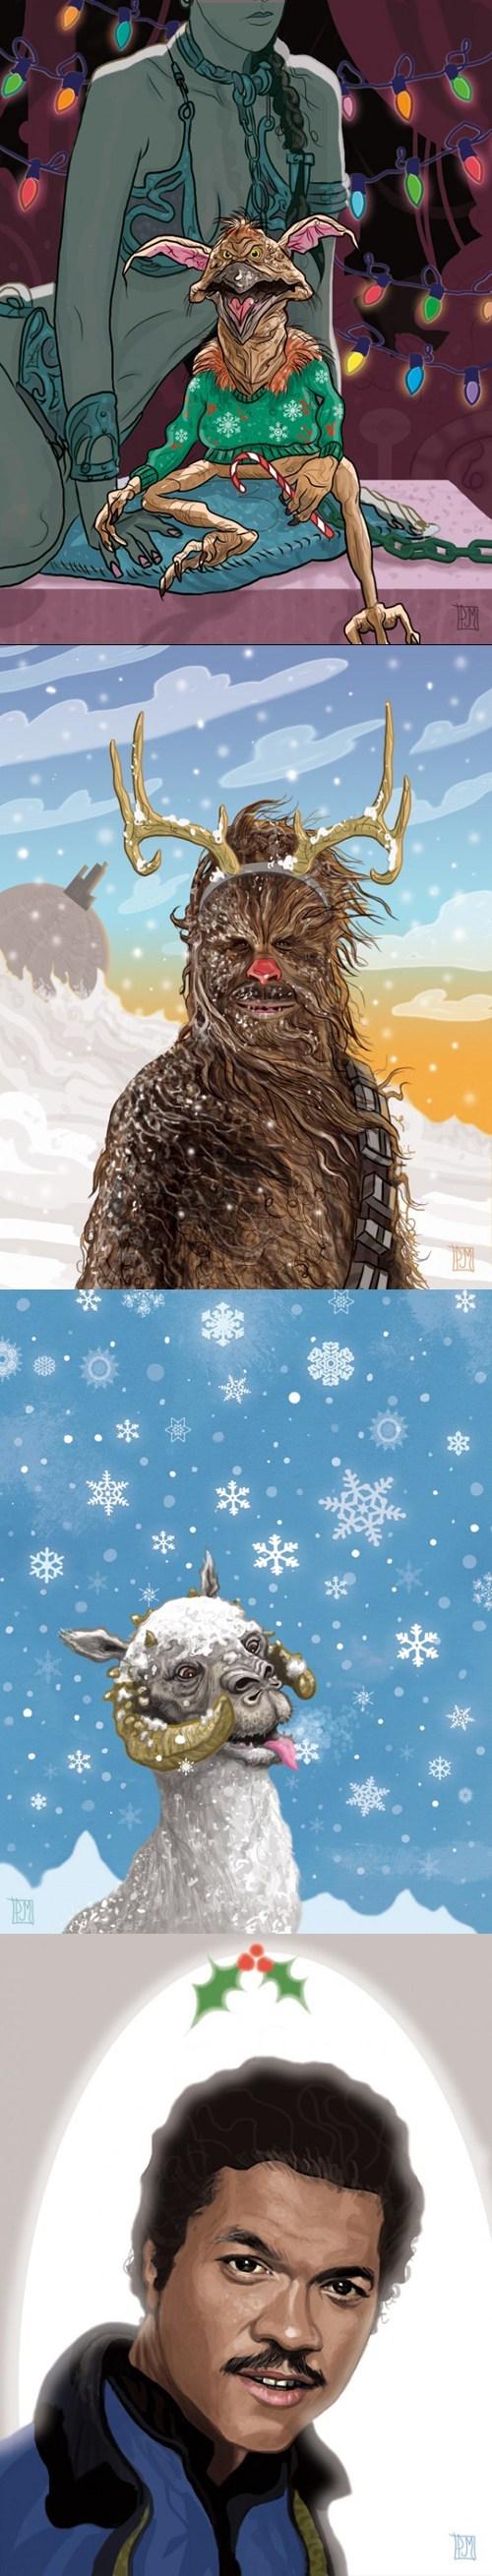 star wars chewbacca Fan Art Lando Calrissian christmas cards Princess Leia - 6878040064